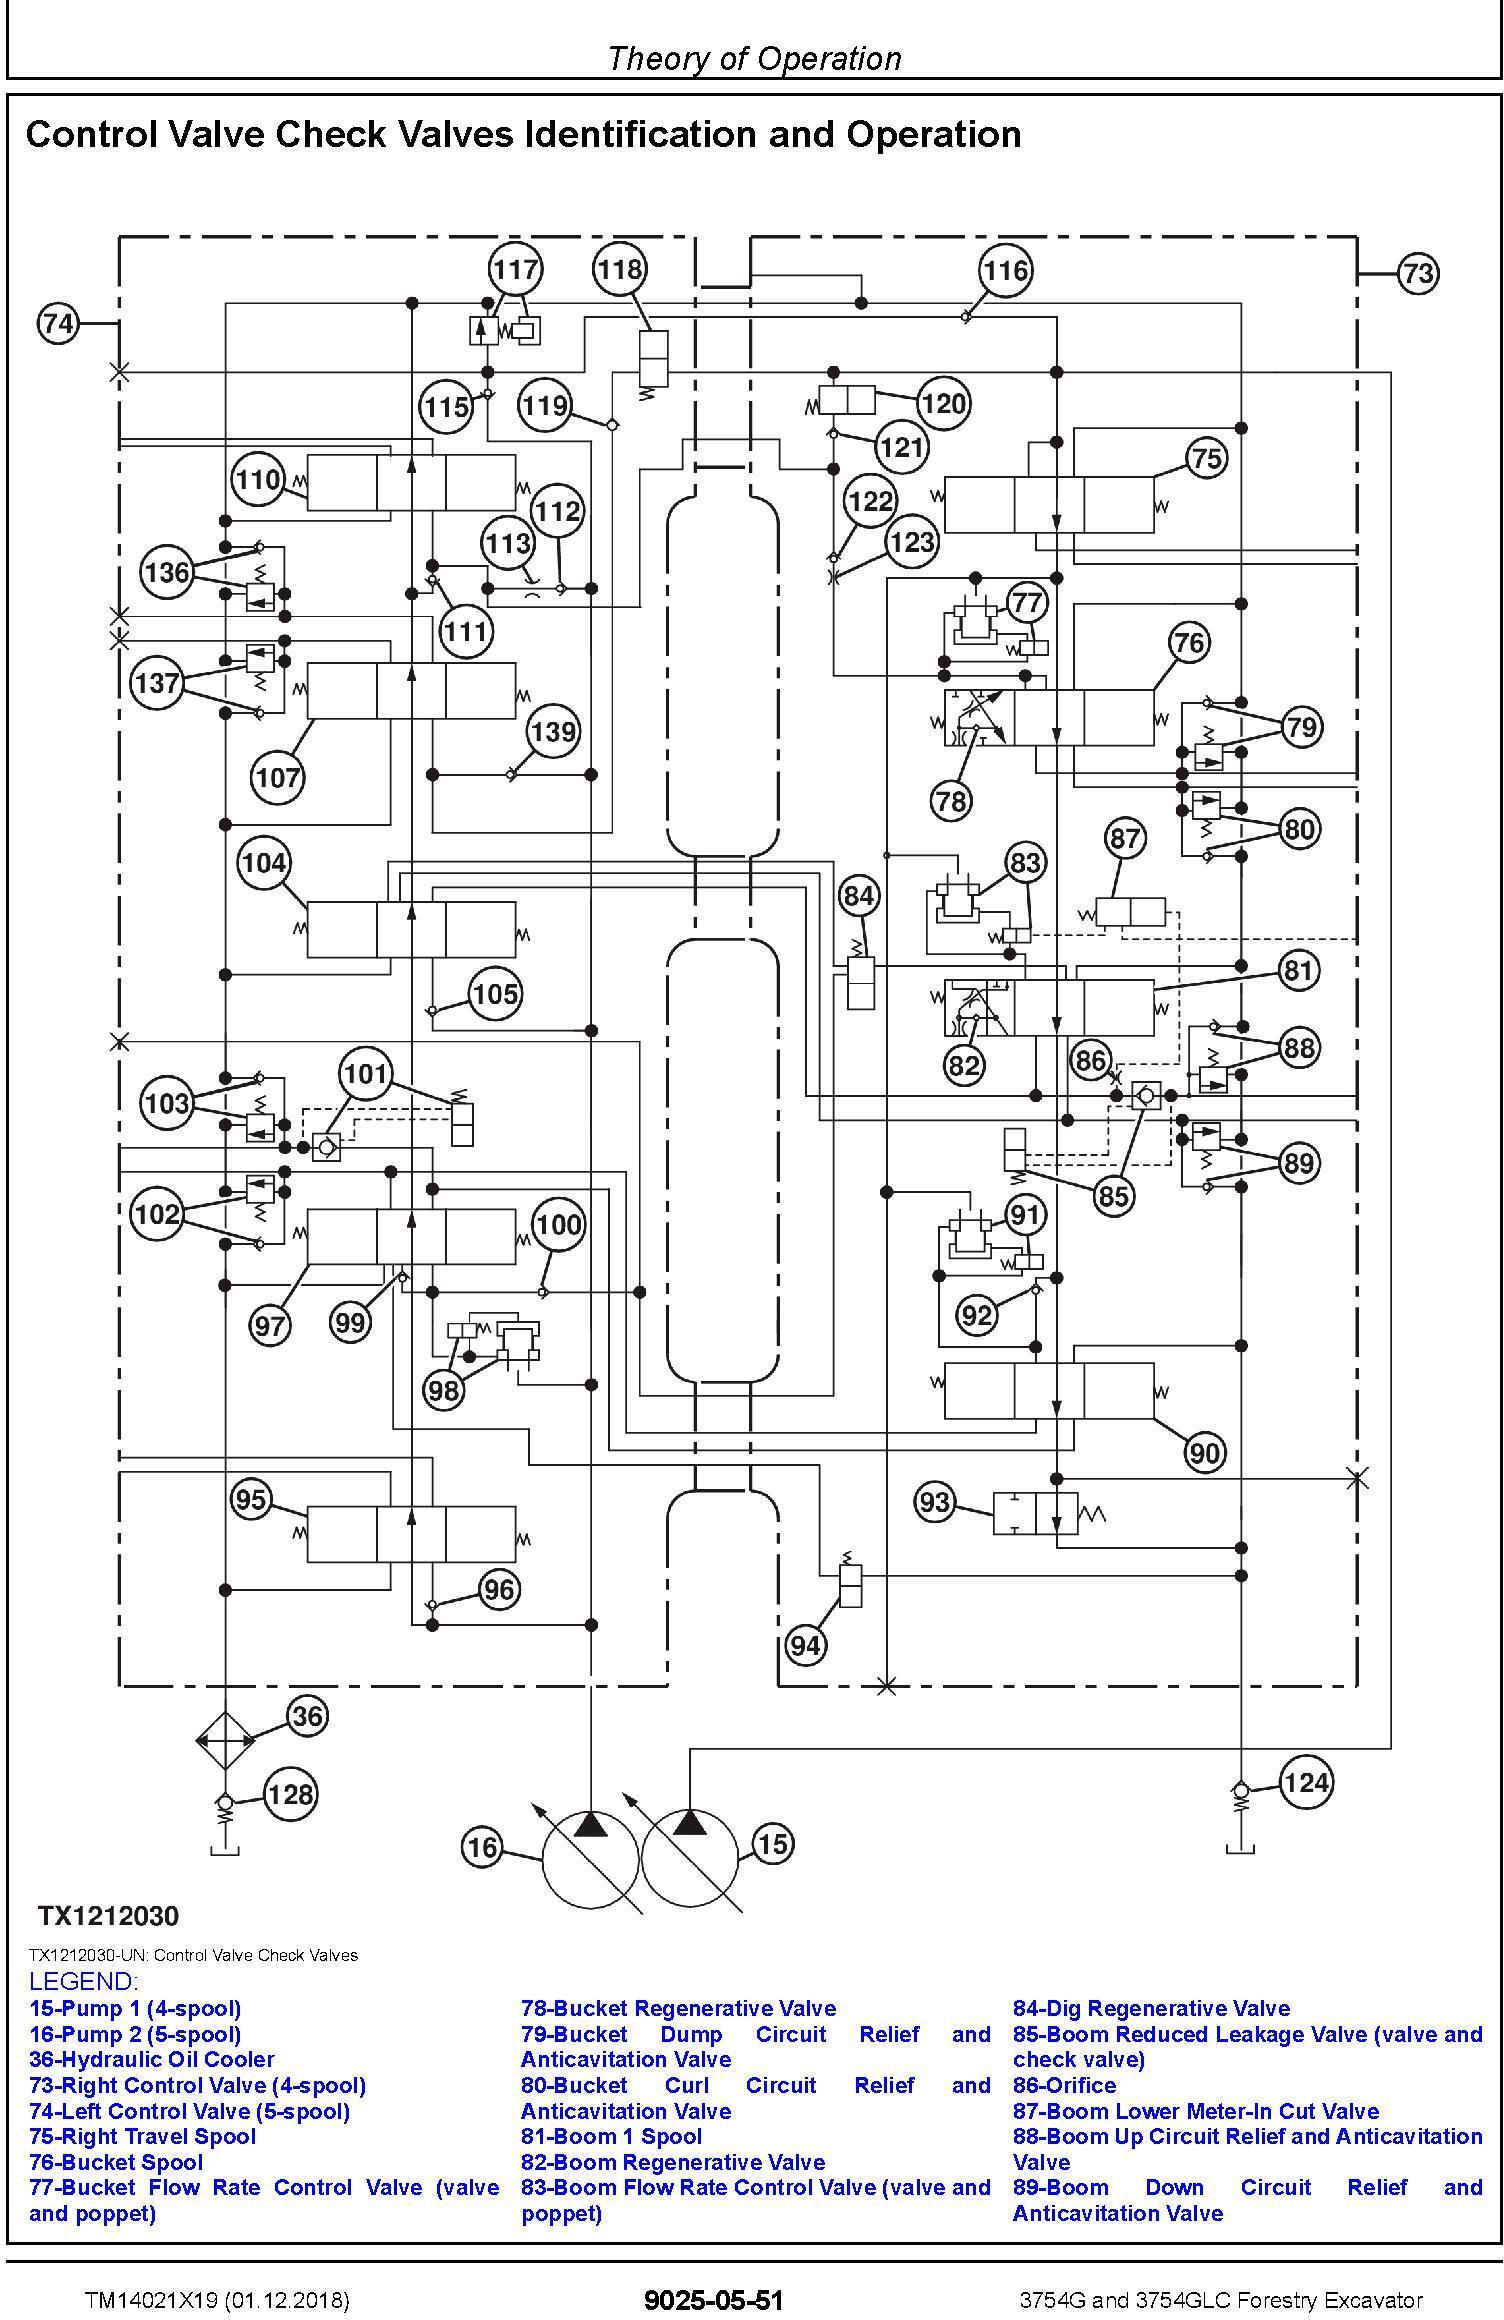 John Deere 3754G, 3754GLC (SN. F371001-) Forestry Excavator Diagnostic Technical Manual (TM14021X19) - 3